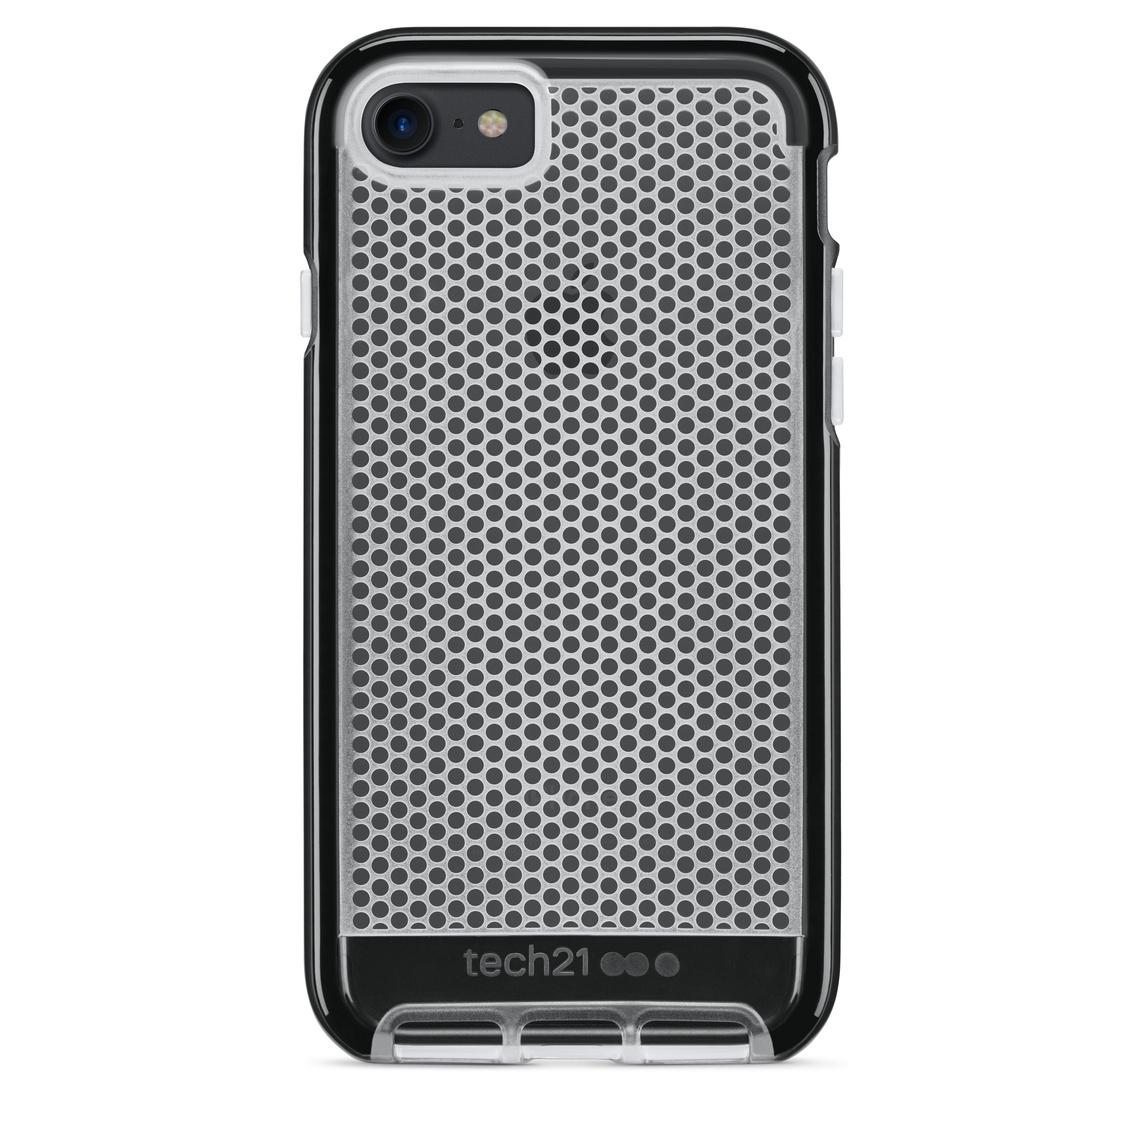 coque evo mesh de tech21 pour iphone 8 plus